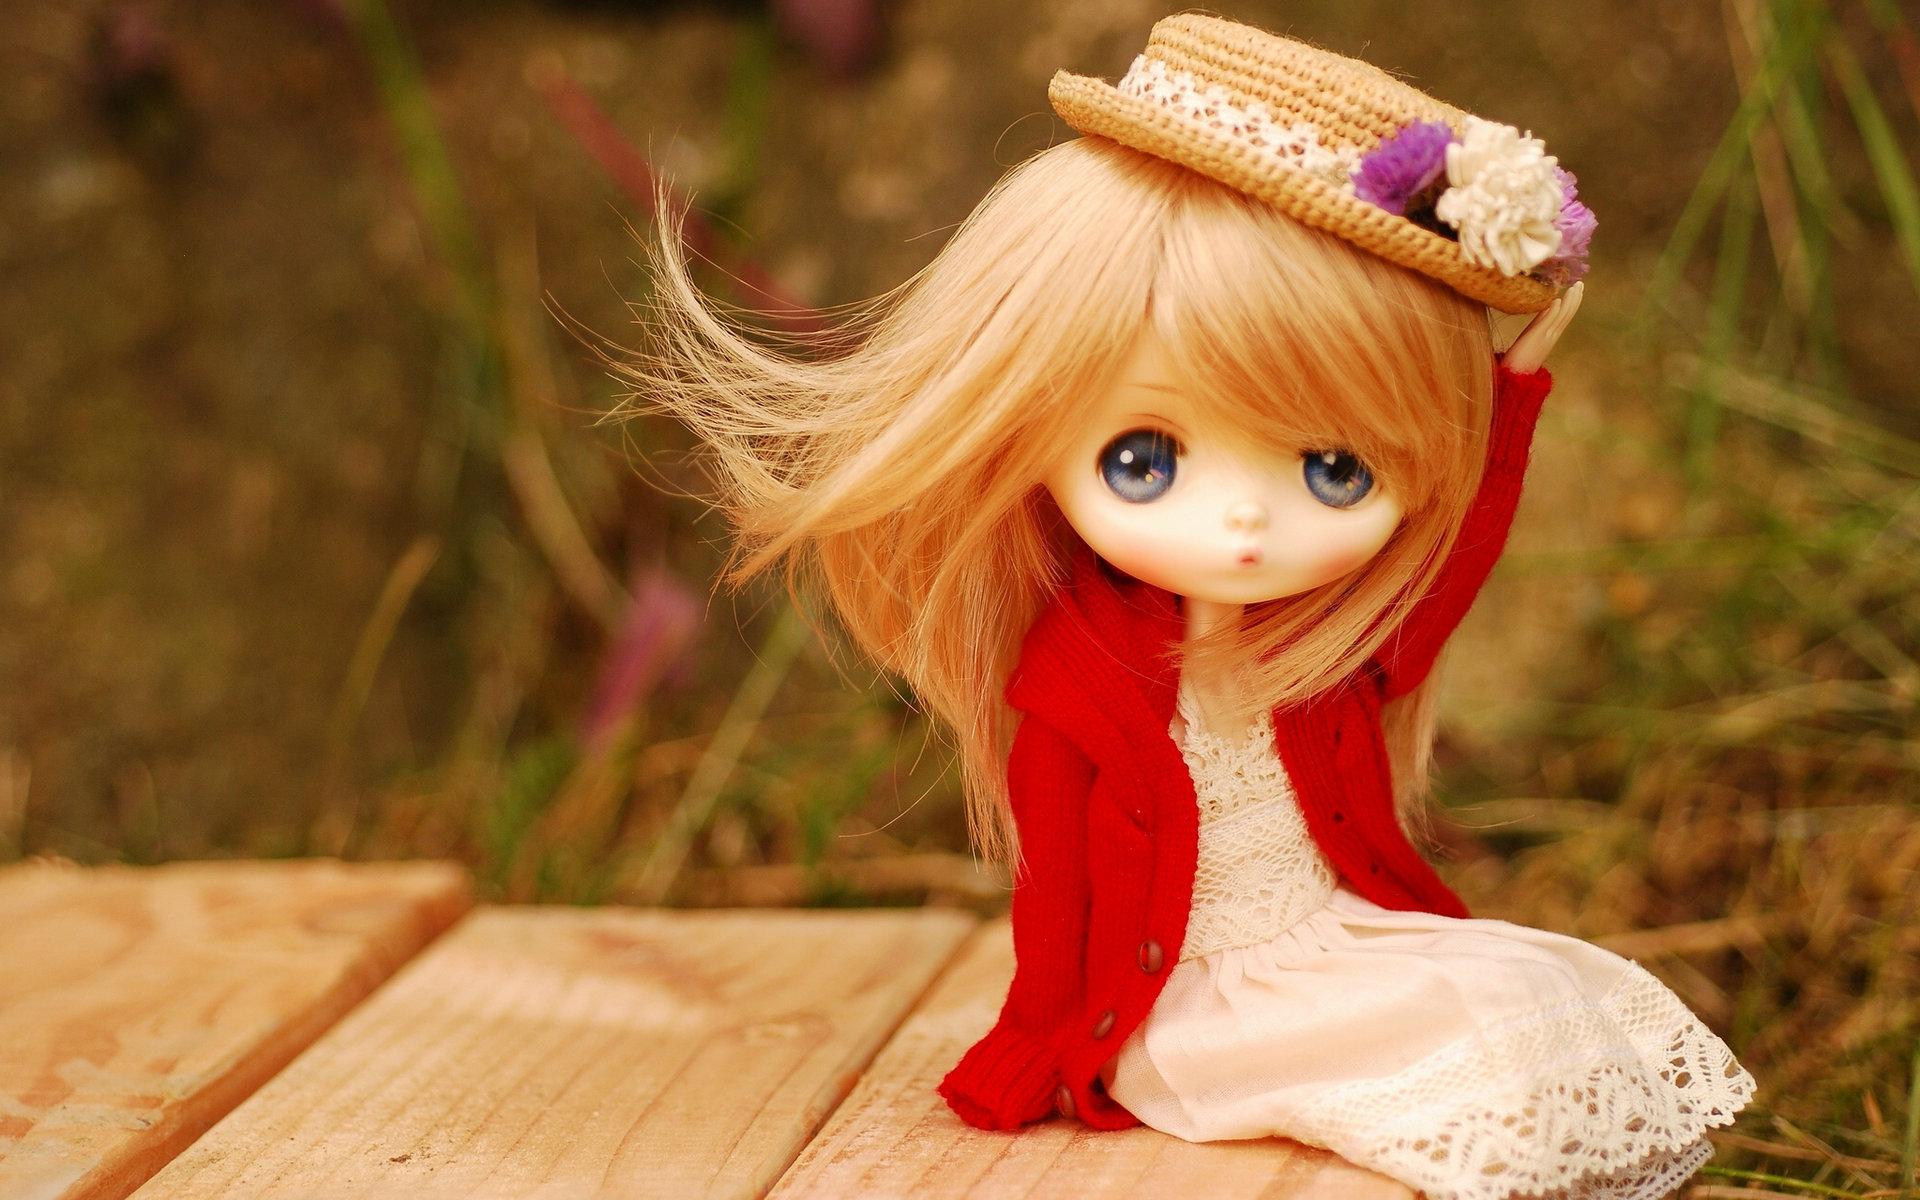 Toy Doll Blue Eyes Wallpaper